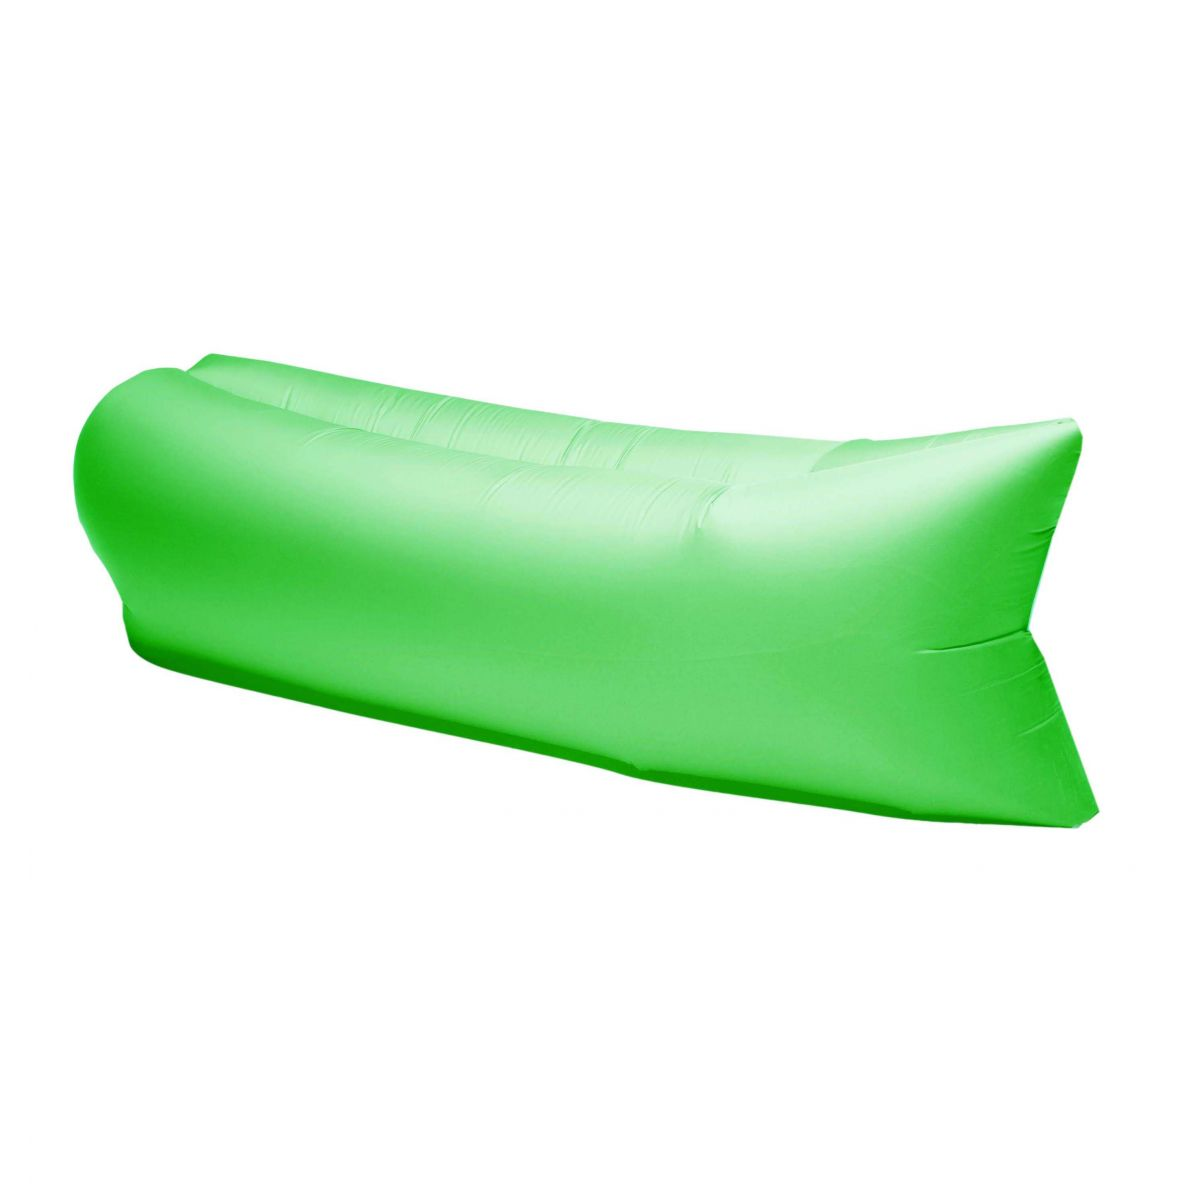 Colchonete Magico Puff Sofa Inflavel Saco Dormir Camping Verde (BSL-PUF-1)